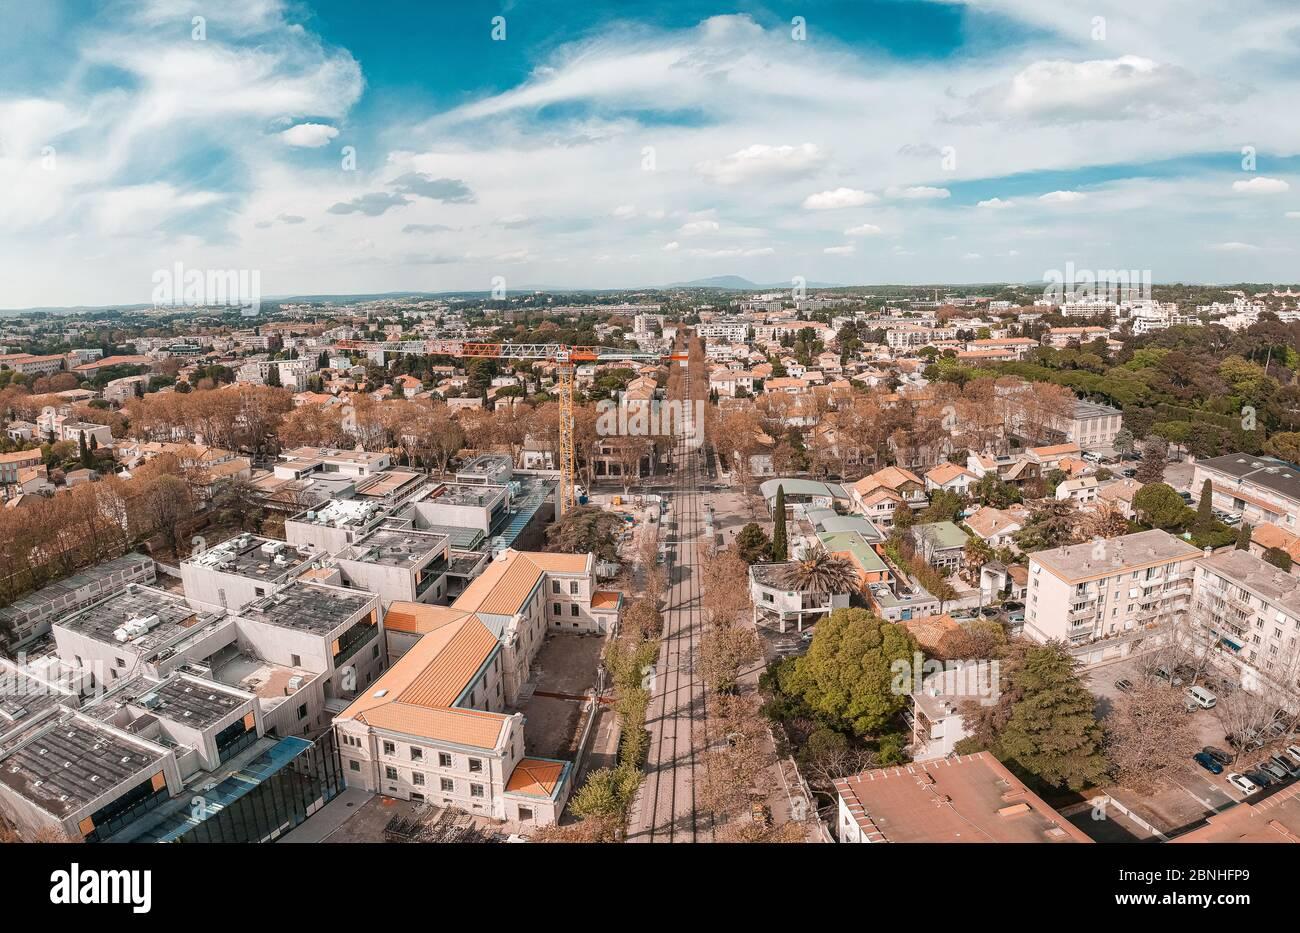 PAnorama in Montpellier, Vue aérienne de Montpellier Stock Photo